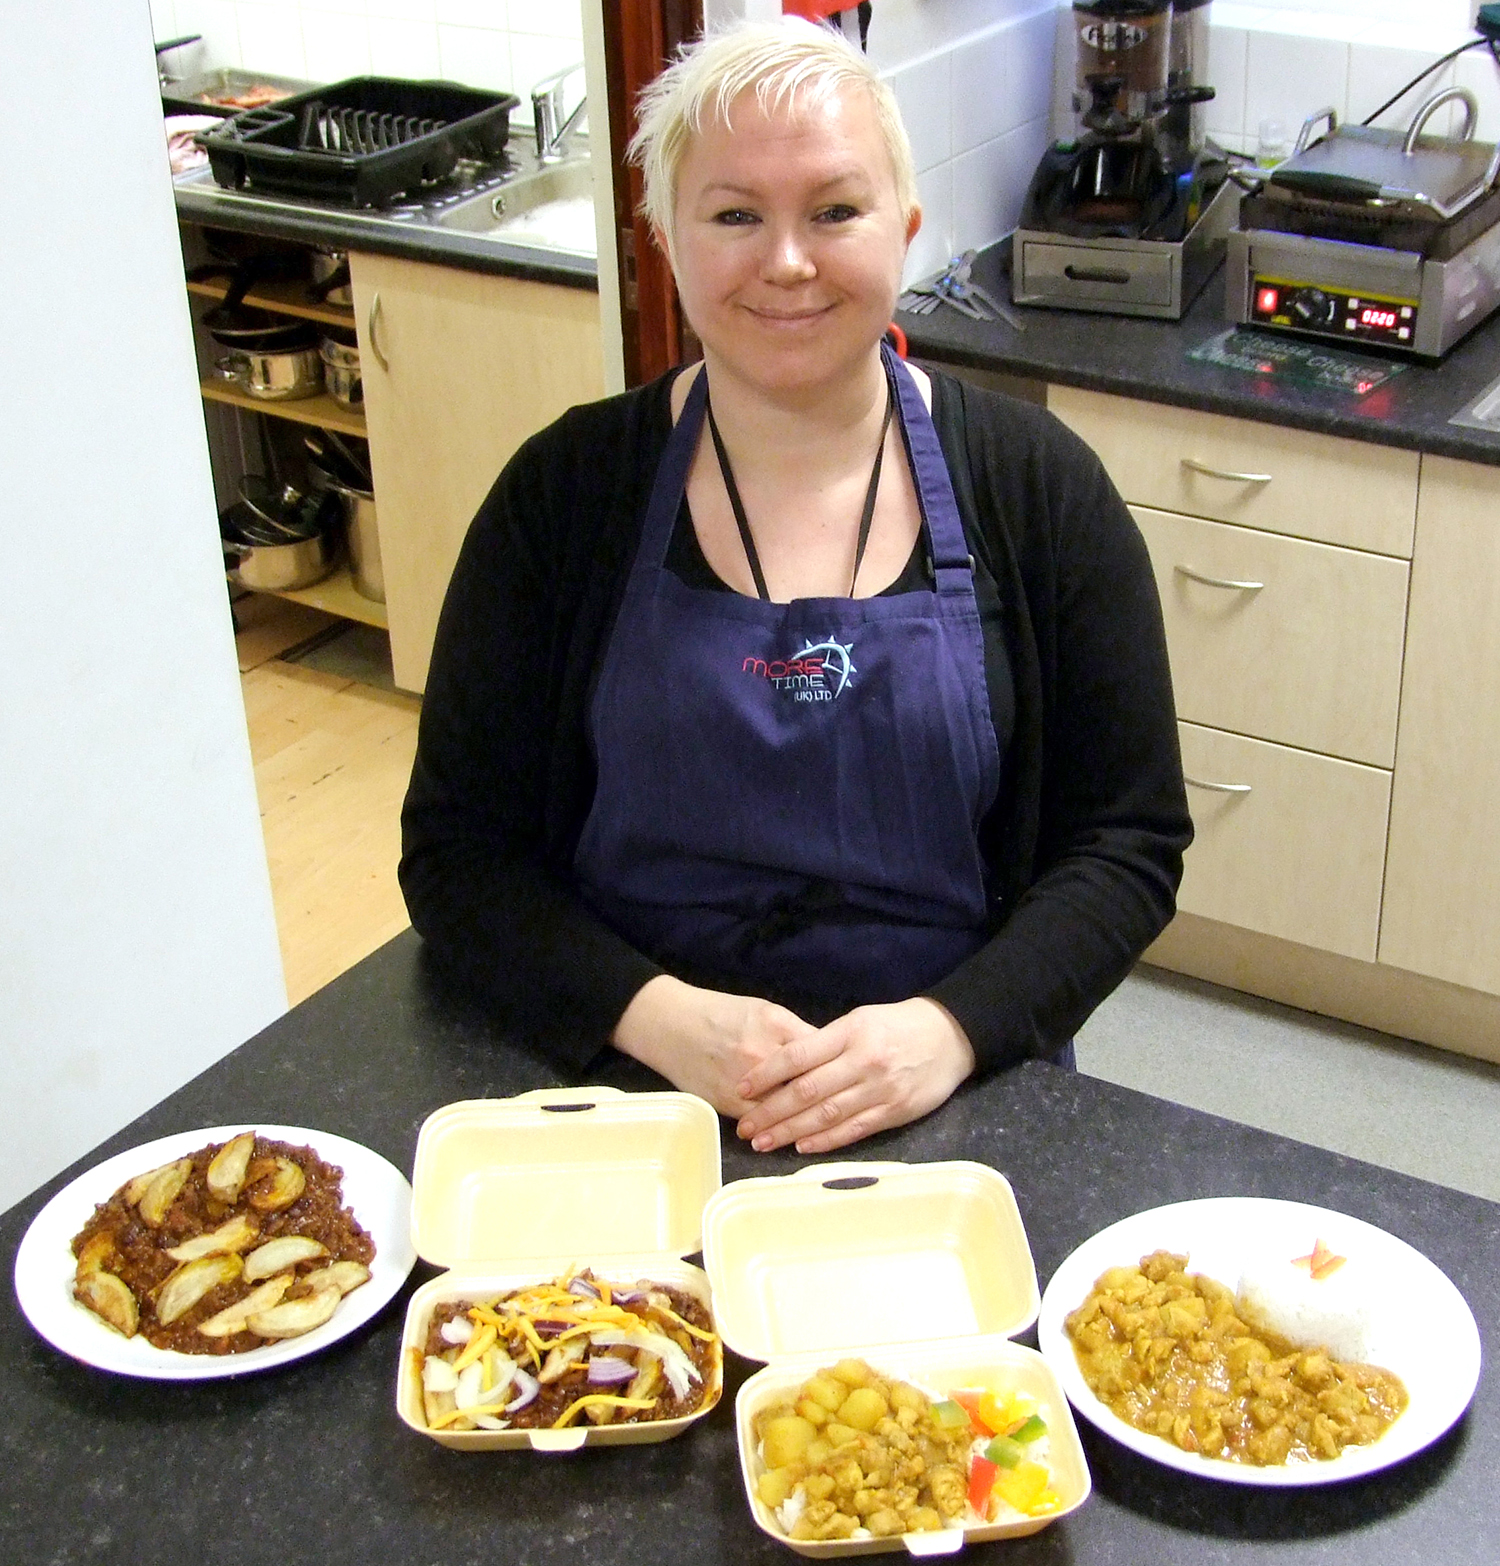 Blue Bridge Cafe Offers Meals for Slimmers